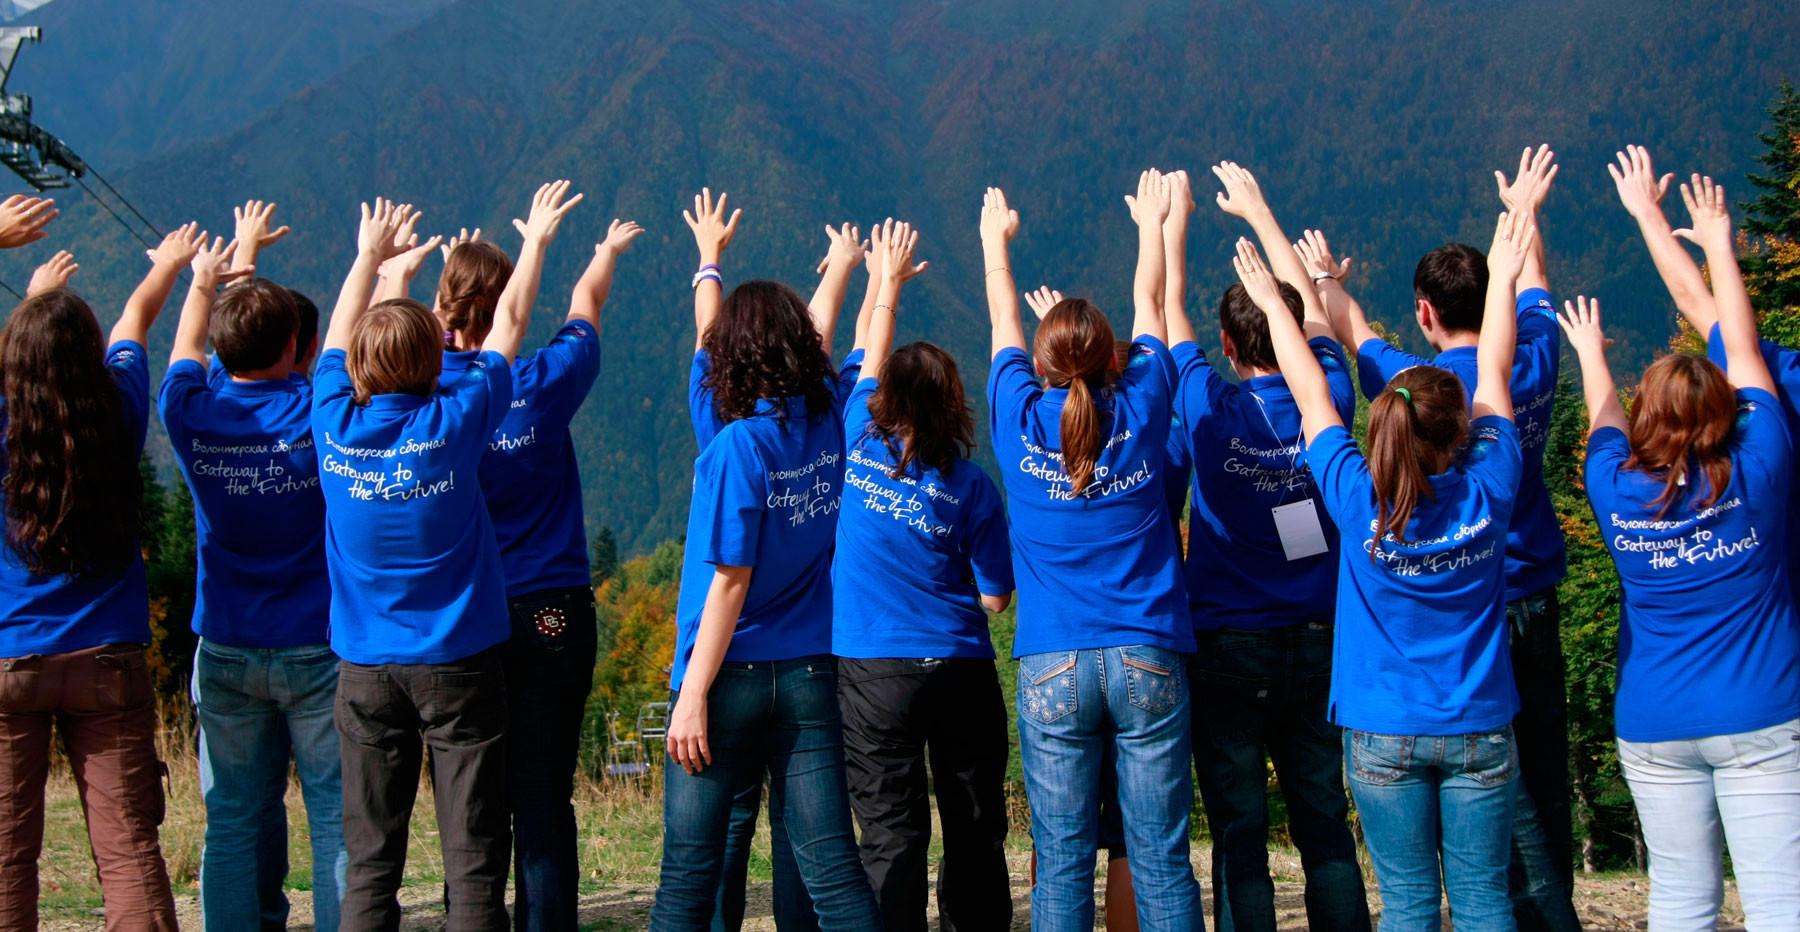 Buenos Aries 2018 receives 20,000 volunteer applications